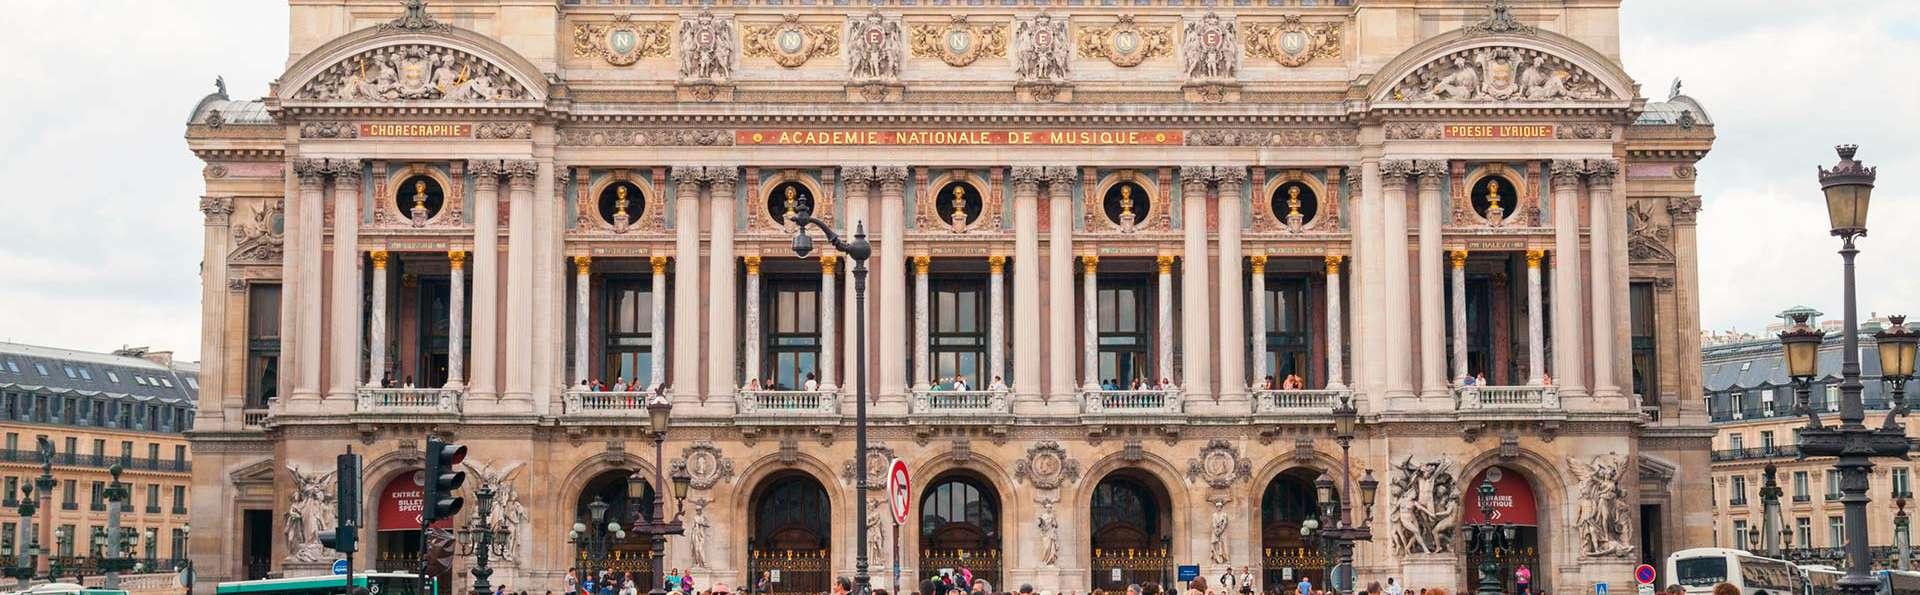 Baudelaire Opéra - EDIT_NEW_DESINATION_05.jpg